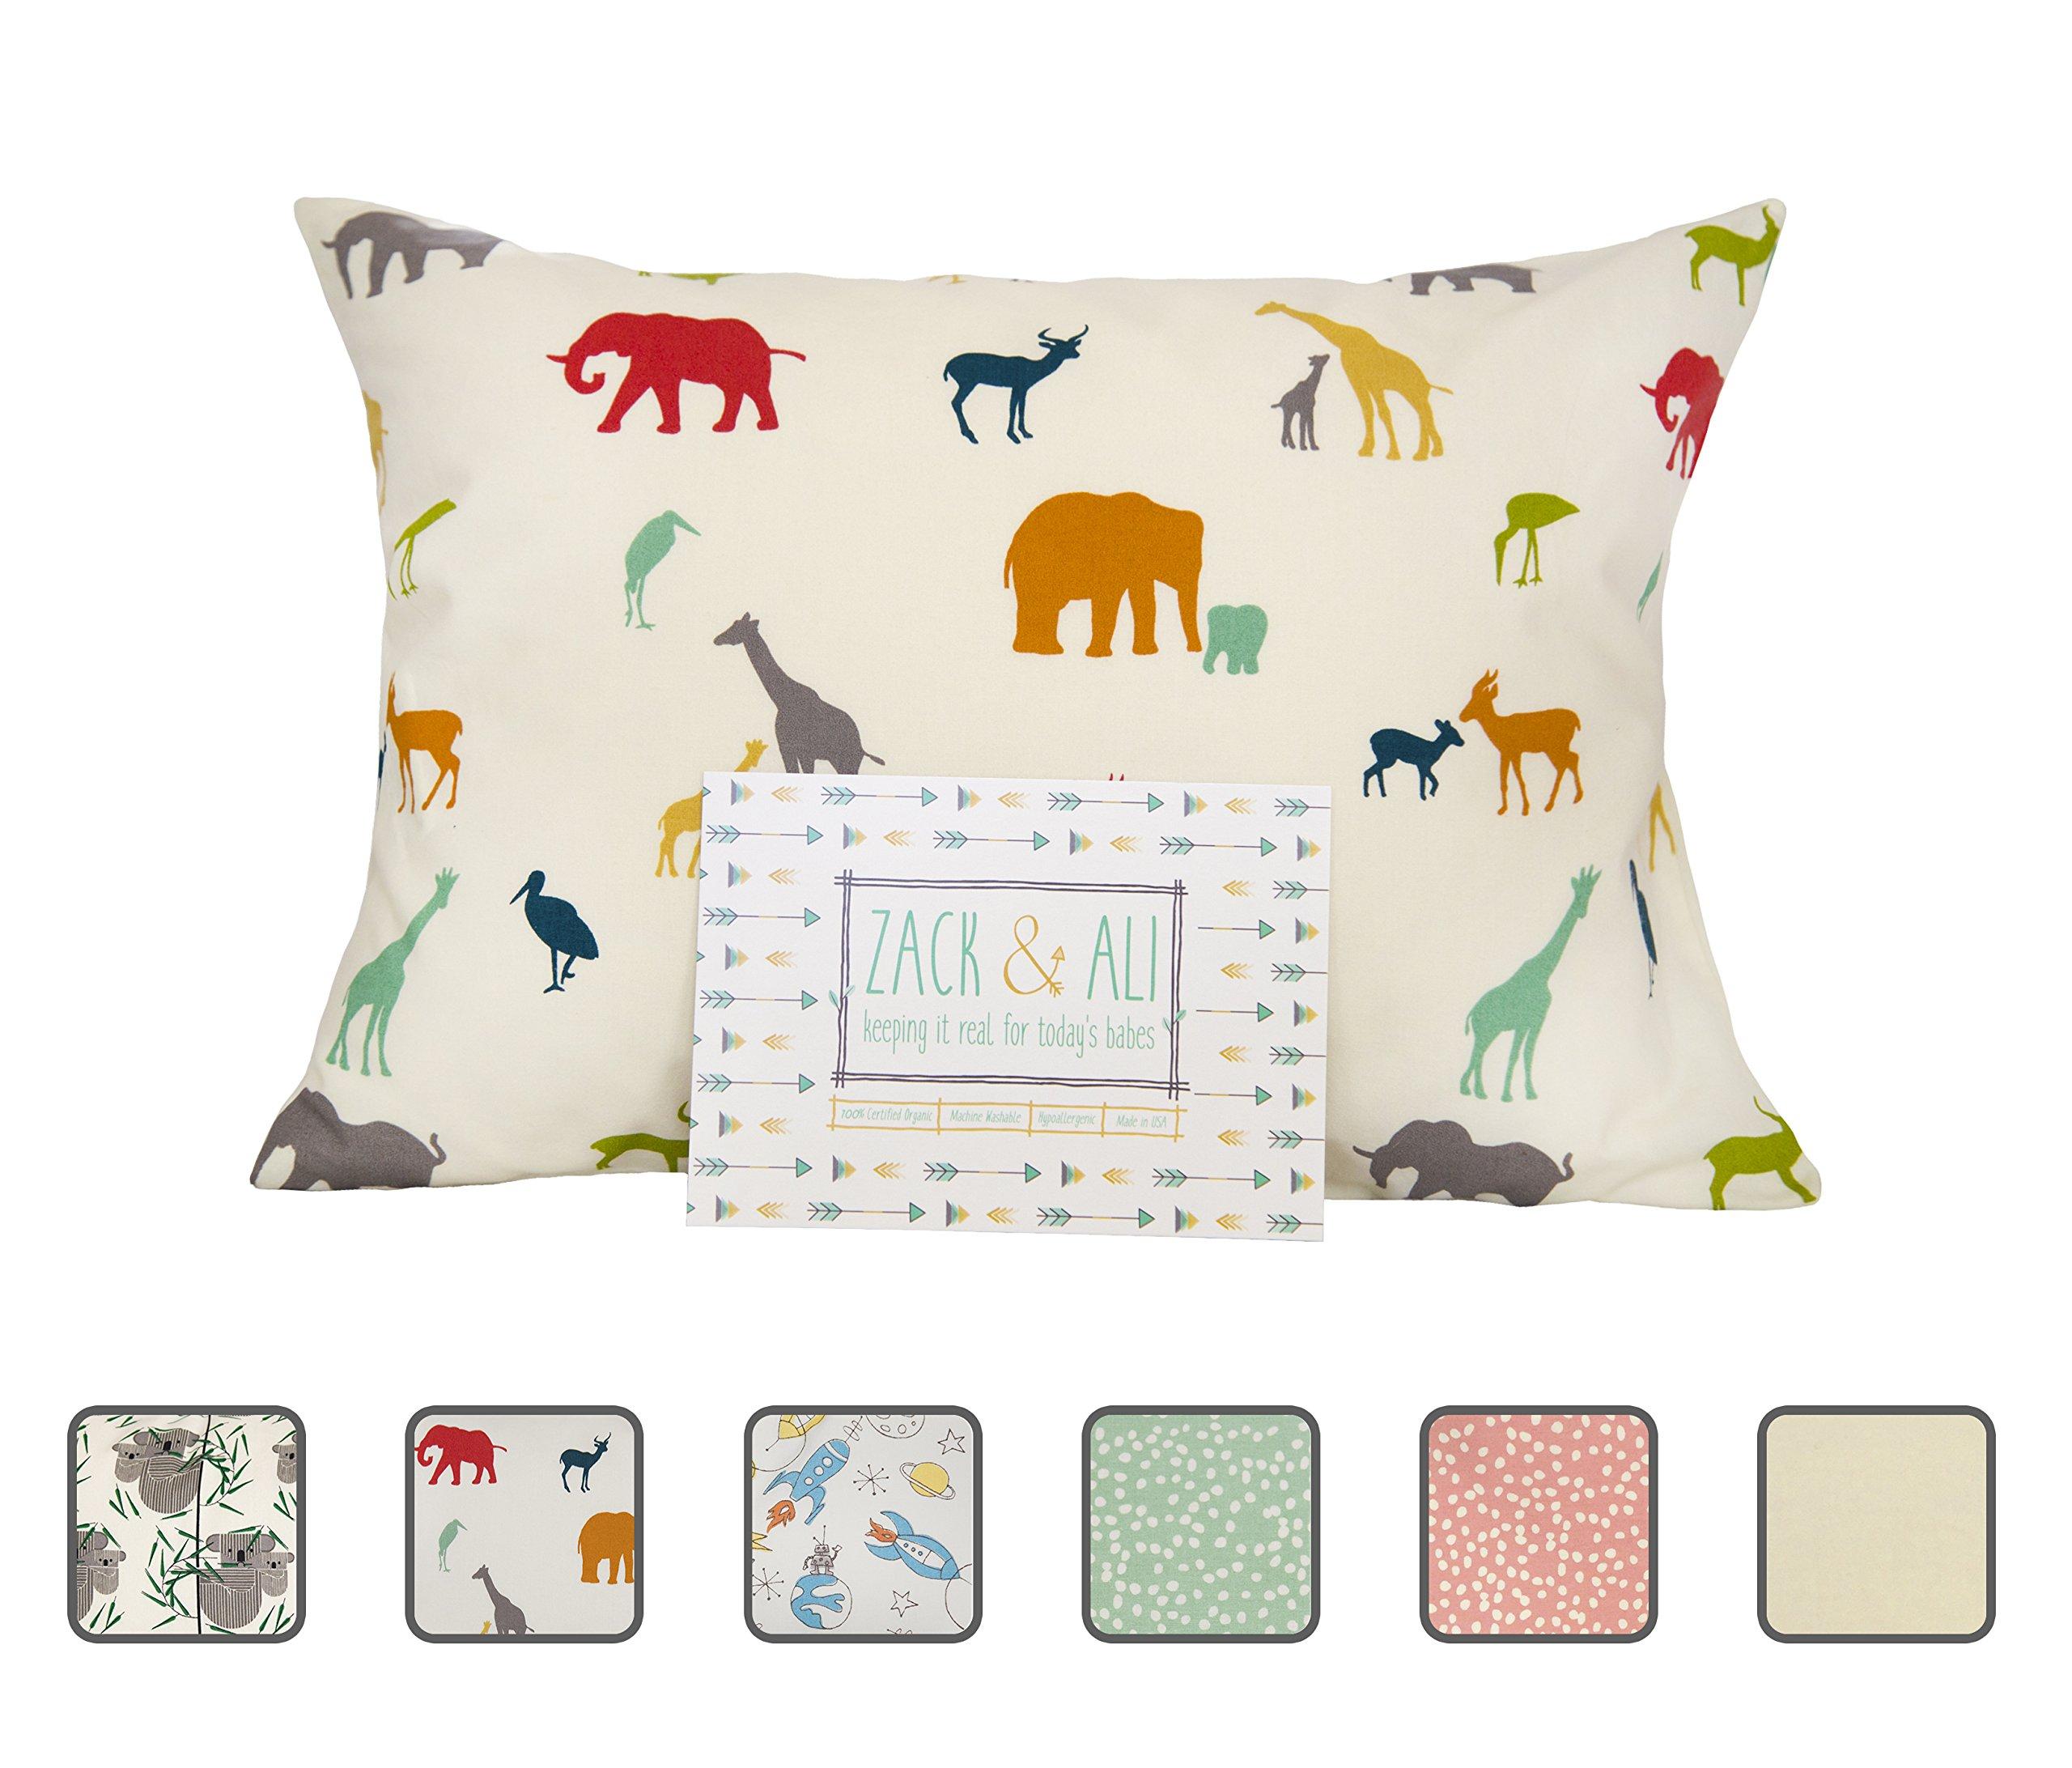 Zack & Ali 100% Organic Toddler Pillowcase (Safari), 13 X 18, Made in USA!